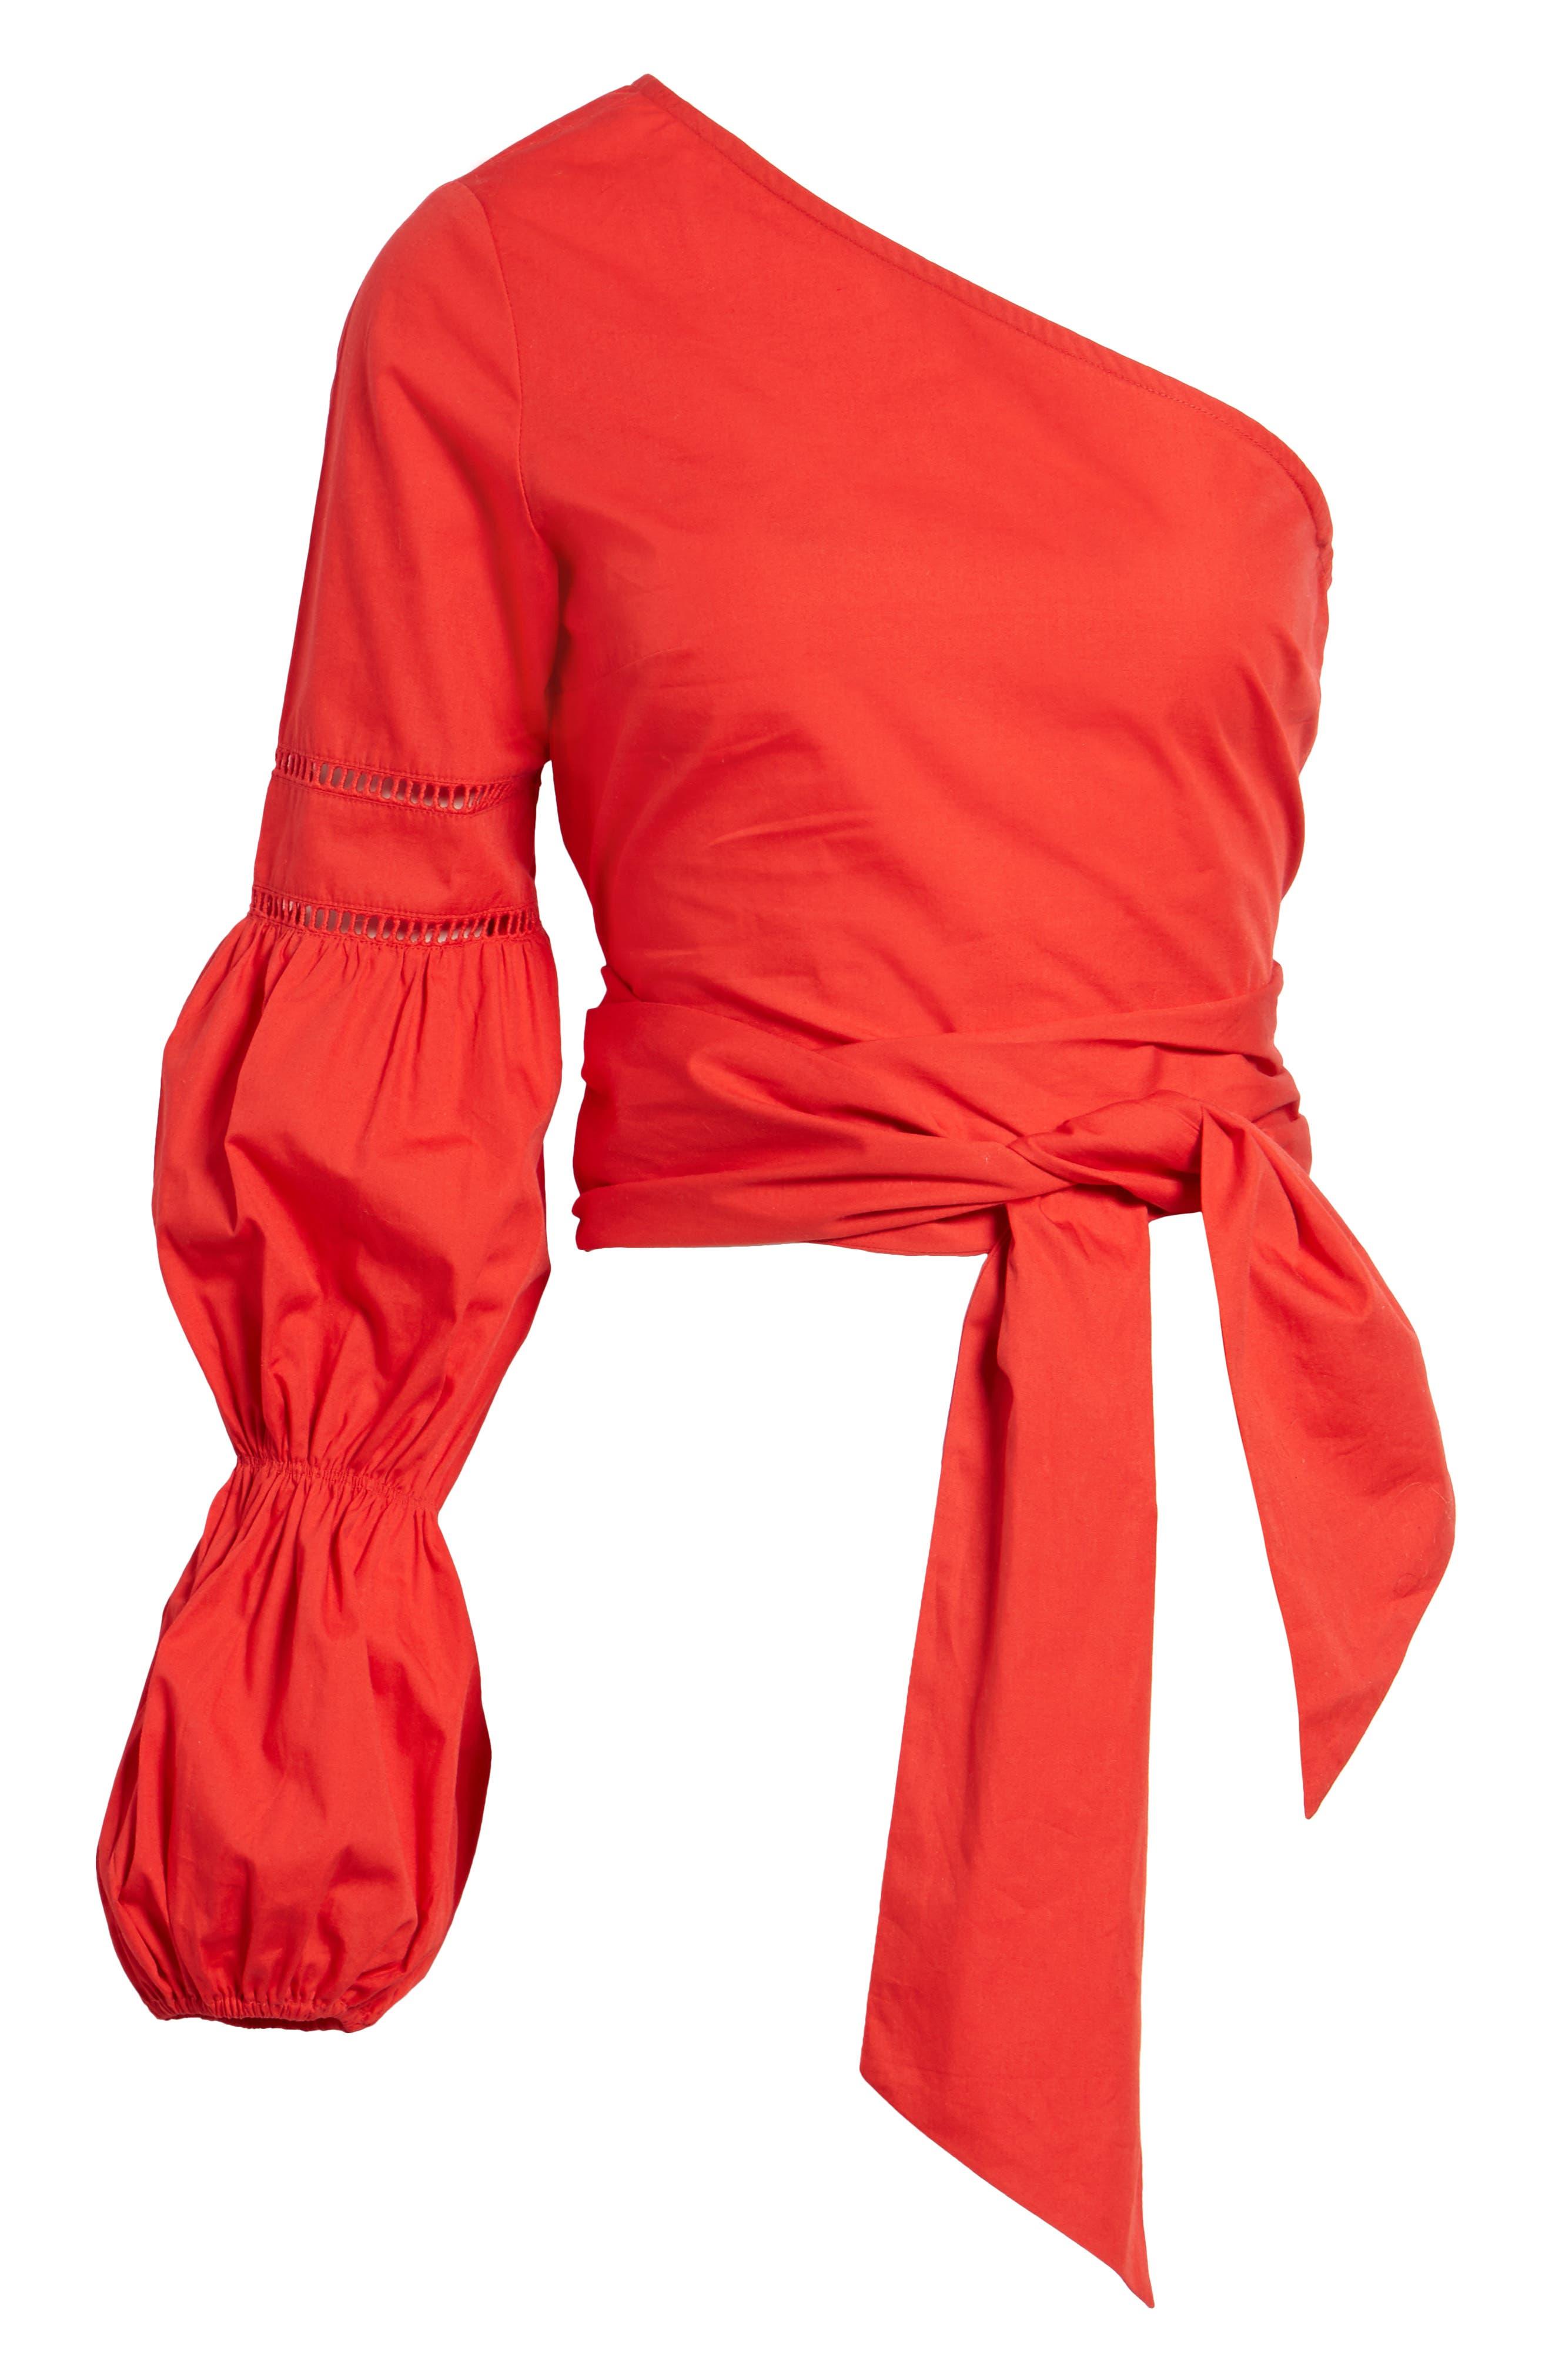 TULAROSA,                             Lola One-Shoulder Blouse,                             Alternate thumbnail 6, color,                             601